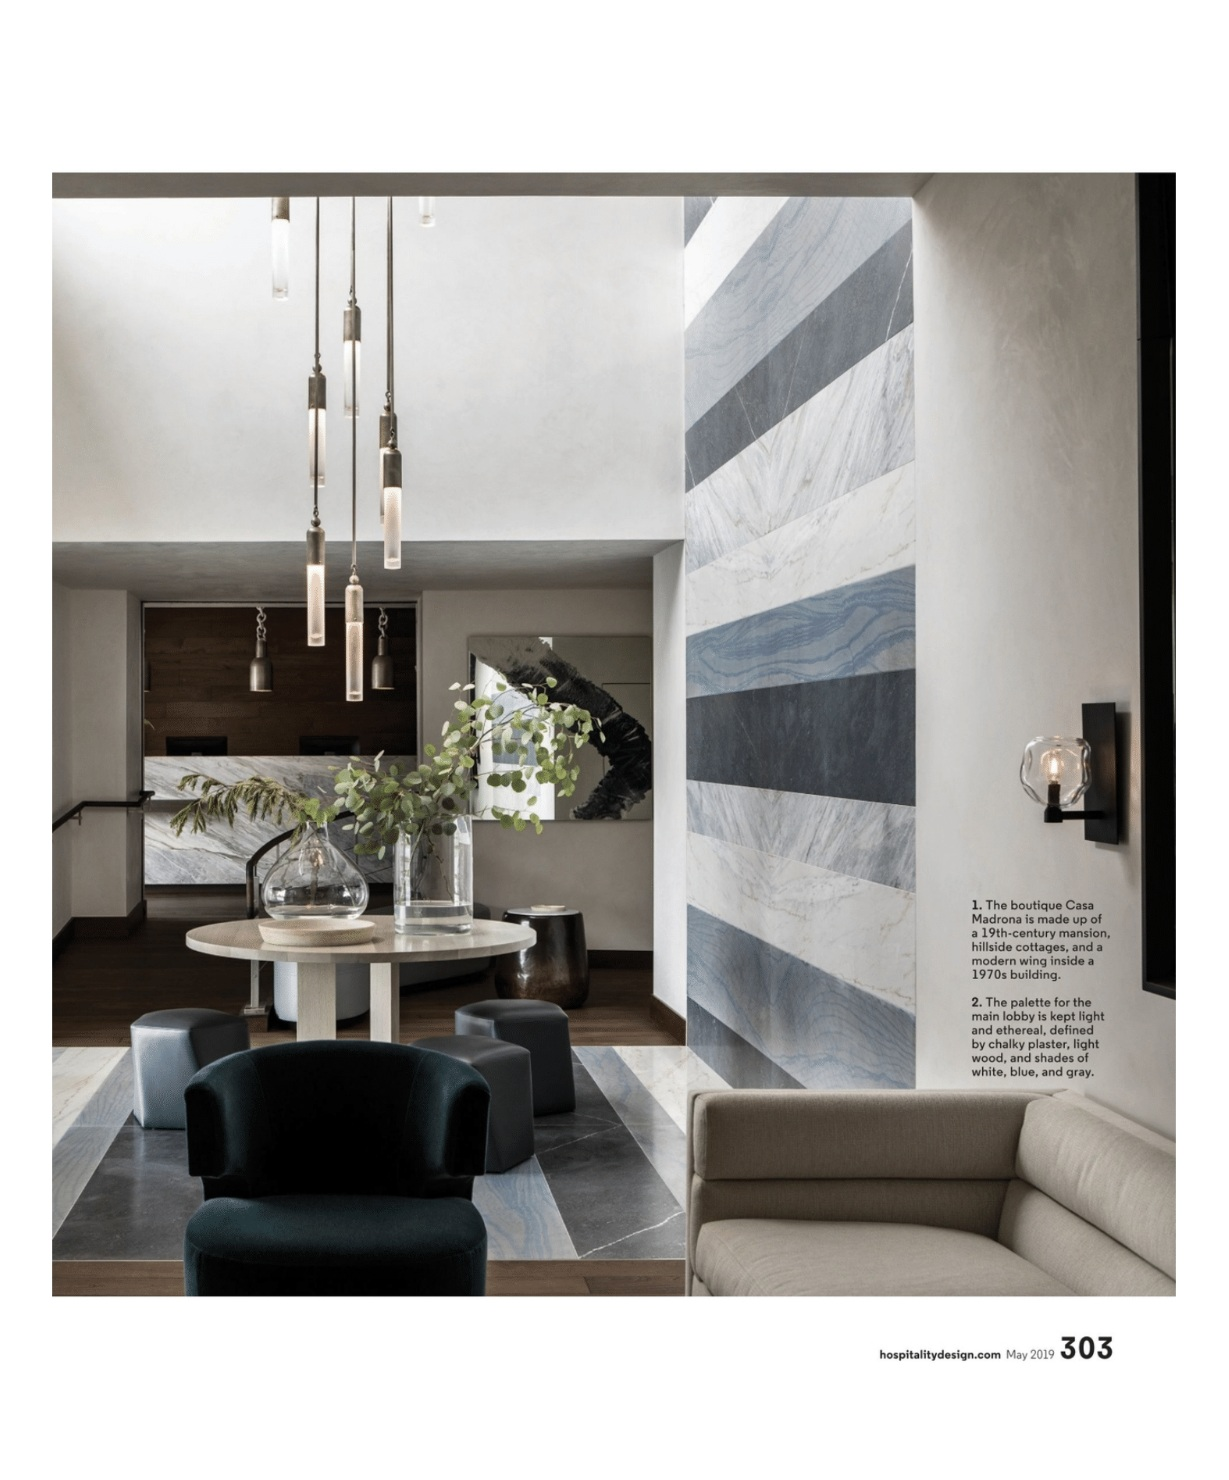 SALT + BONES featured in   Hospitality Design  . Photo by Laure Joliet.